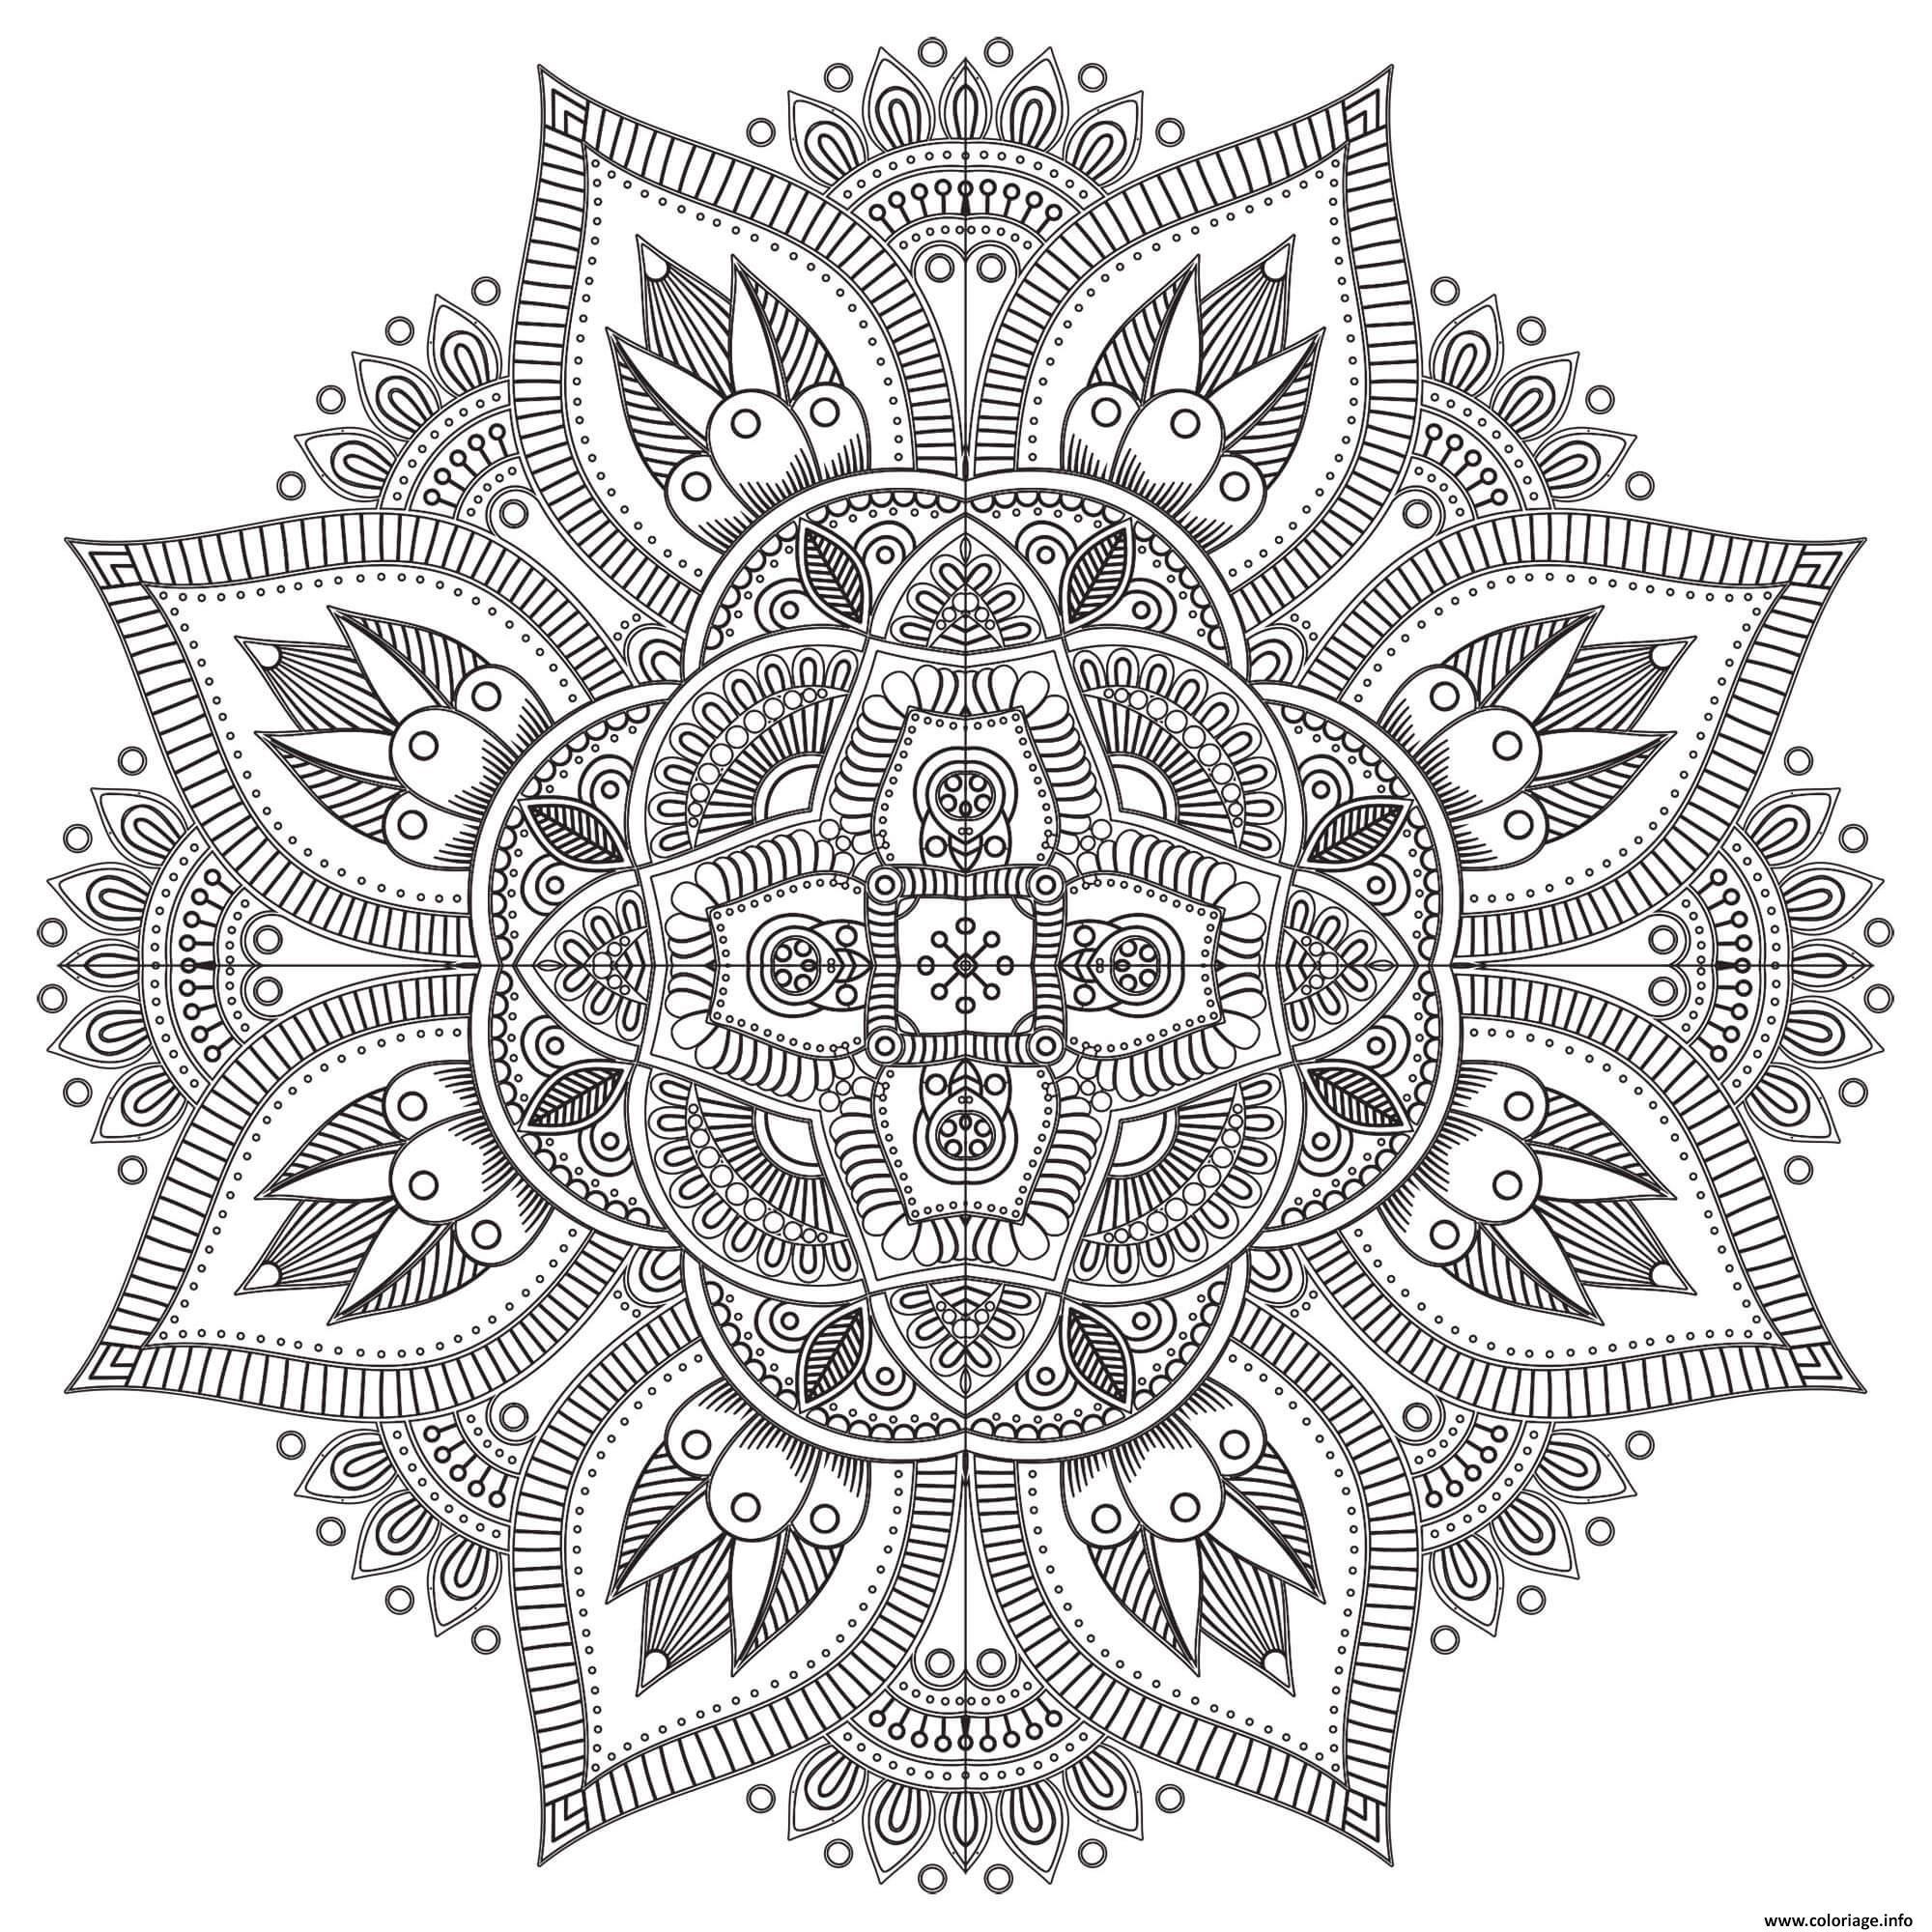 Coloriage Mandala Zen Antistress Difficile Dessin